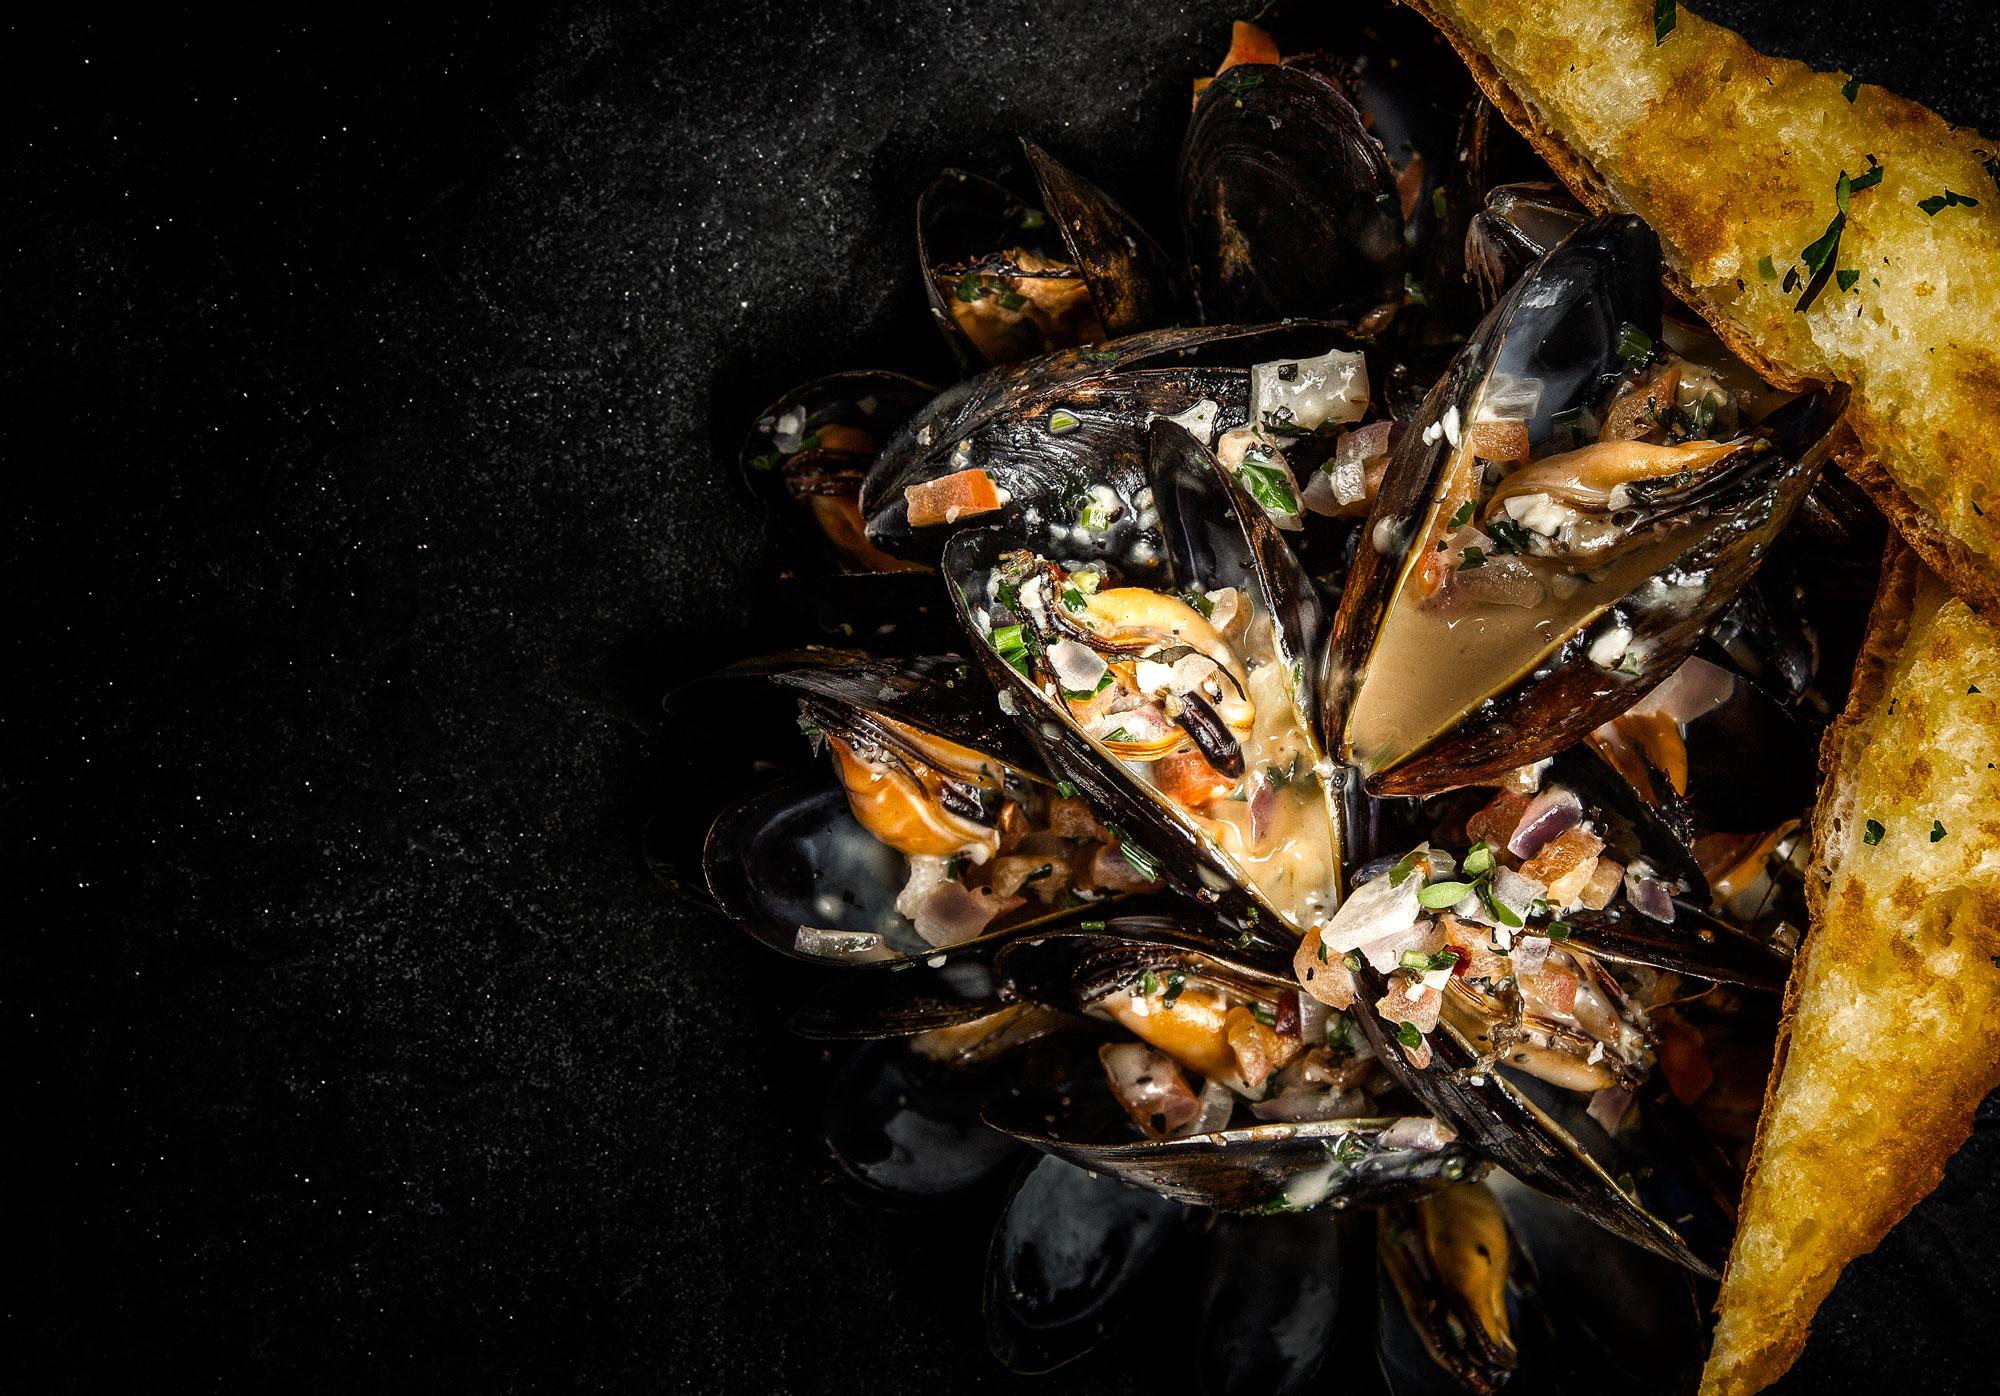 Seafood Fotografie fur Hilton Hotels - Professionelle Foodfotograf Adrian Kilchherr aus Schweiz